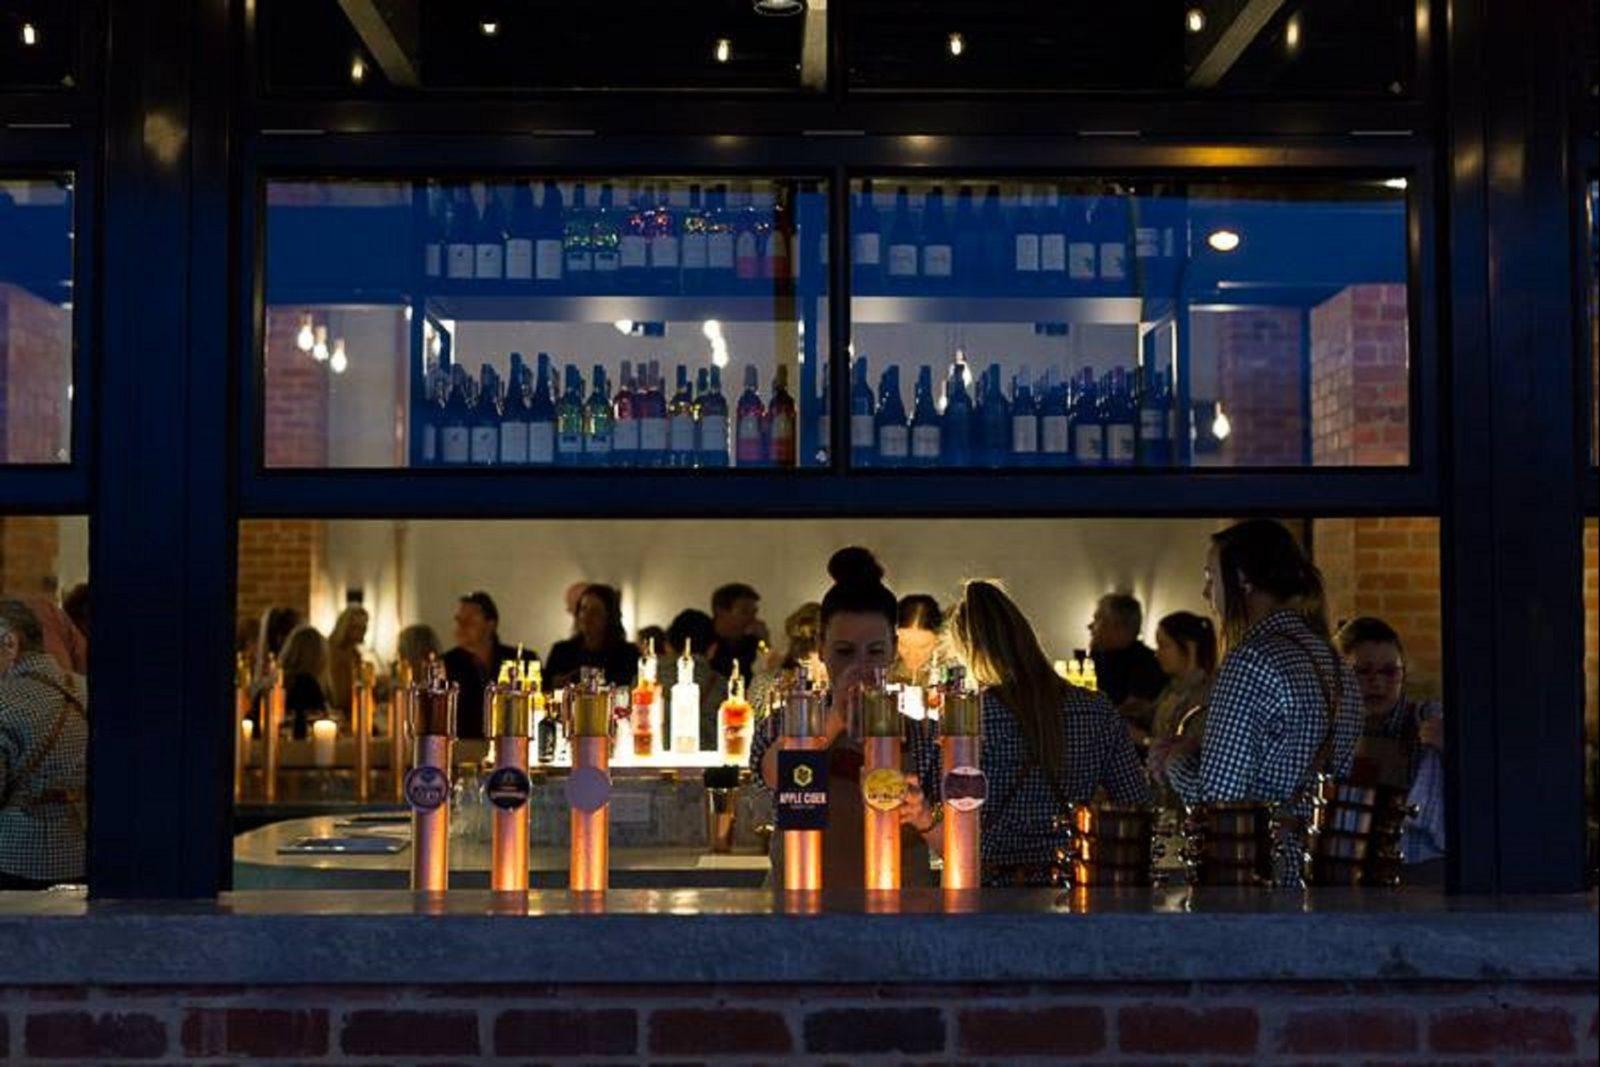 Small's Bar, Bunbury, Western Australia